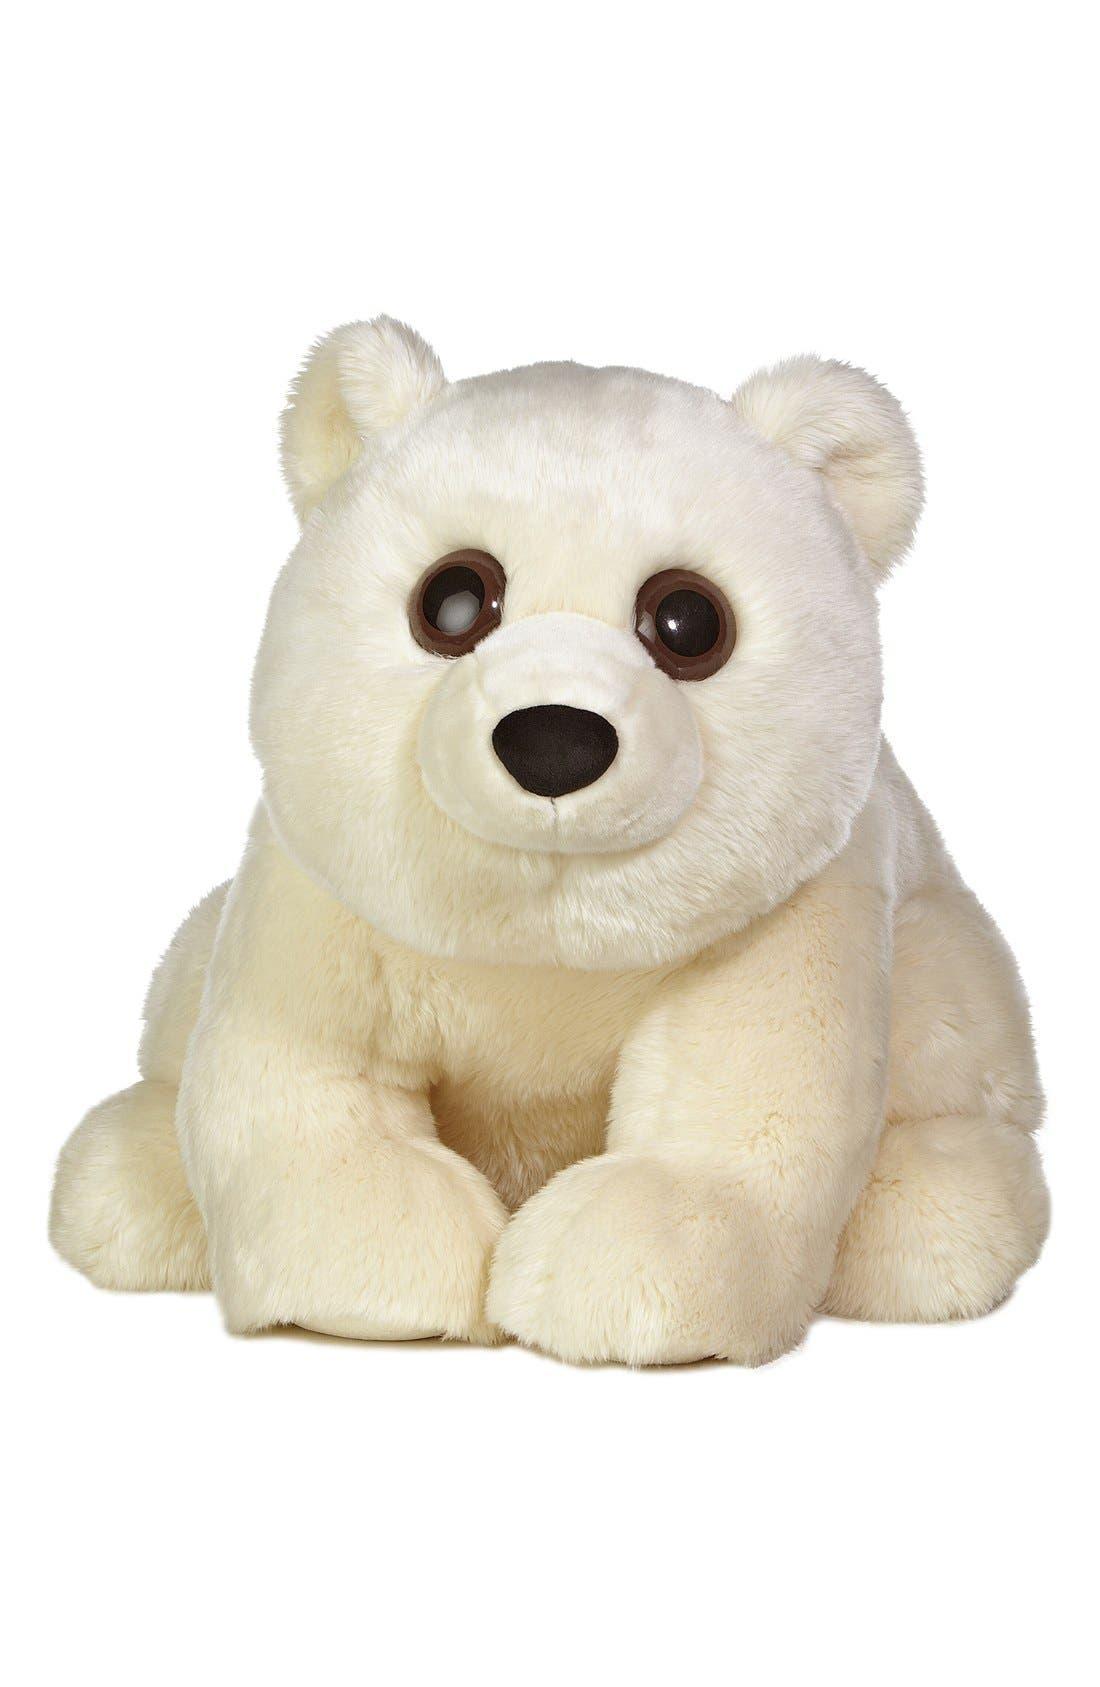 AURORA WORLD TOYS 'Americana Bears - Arctic Polar